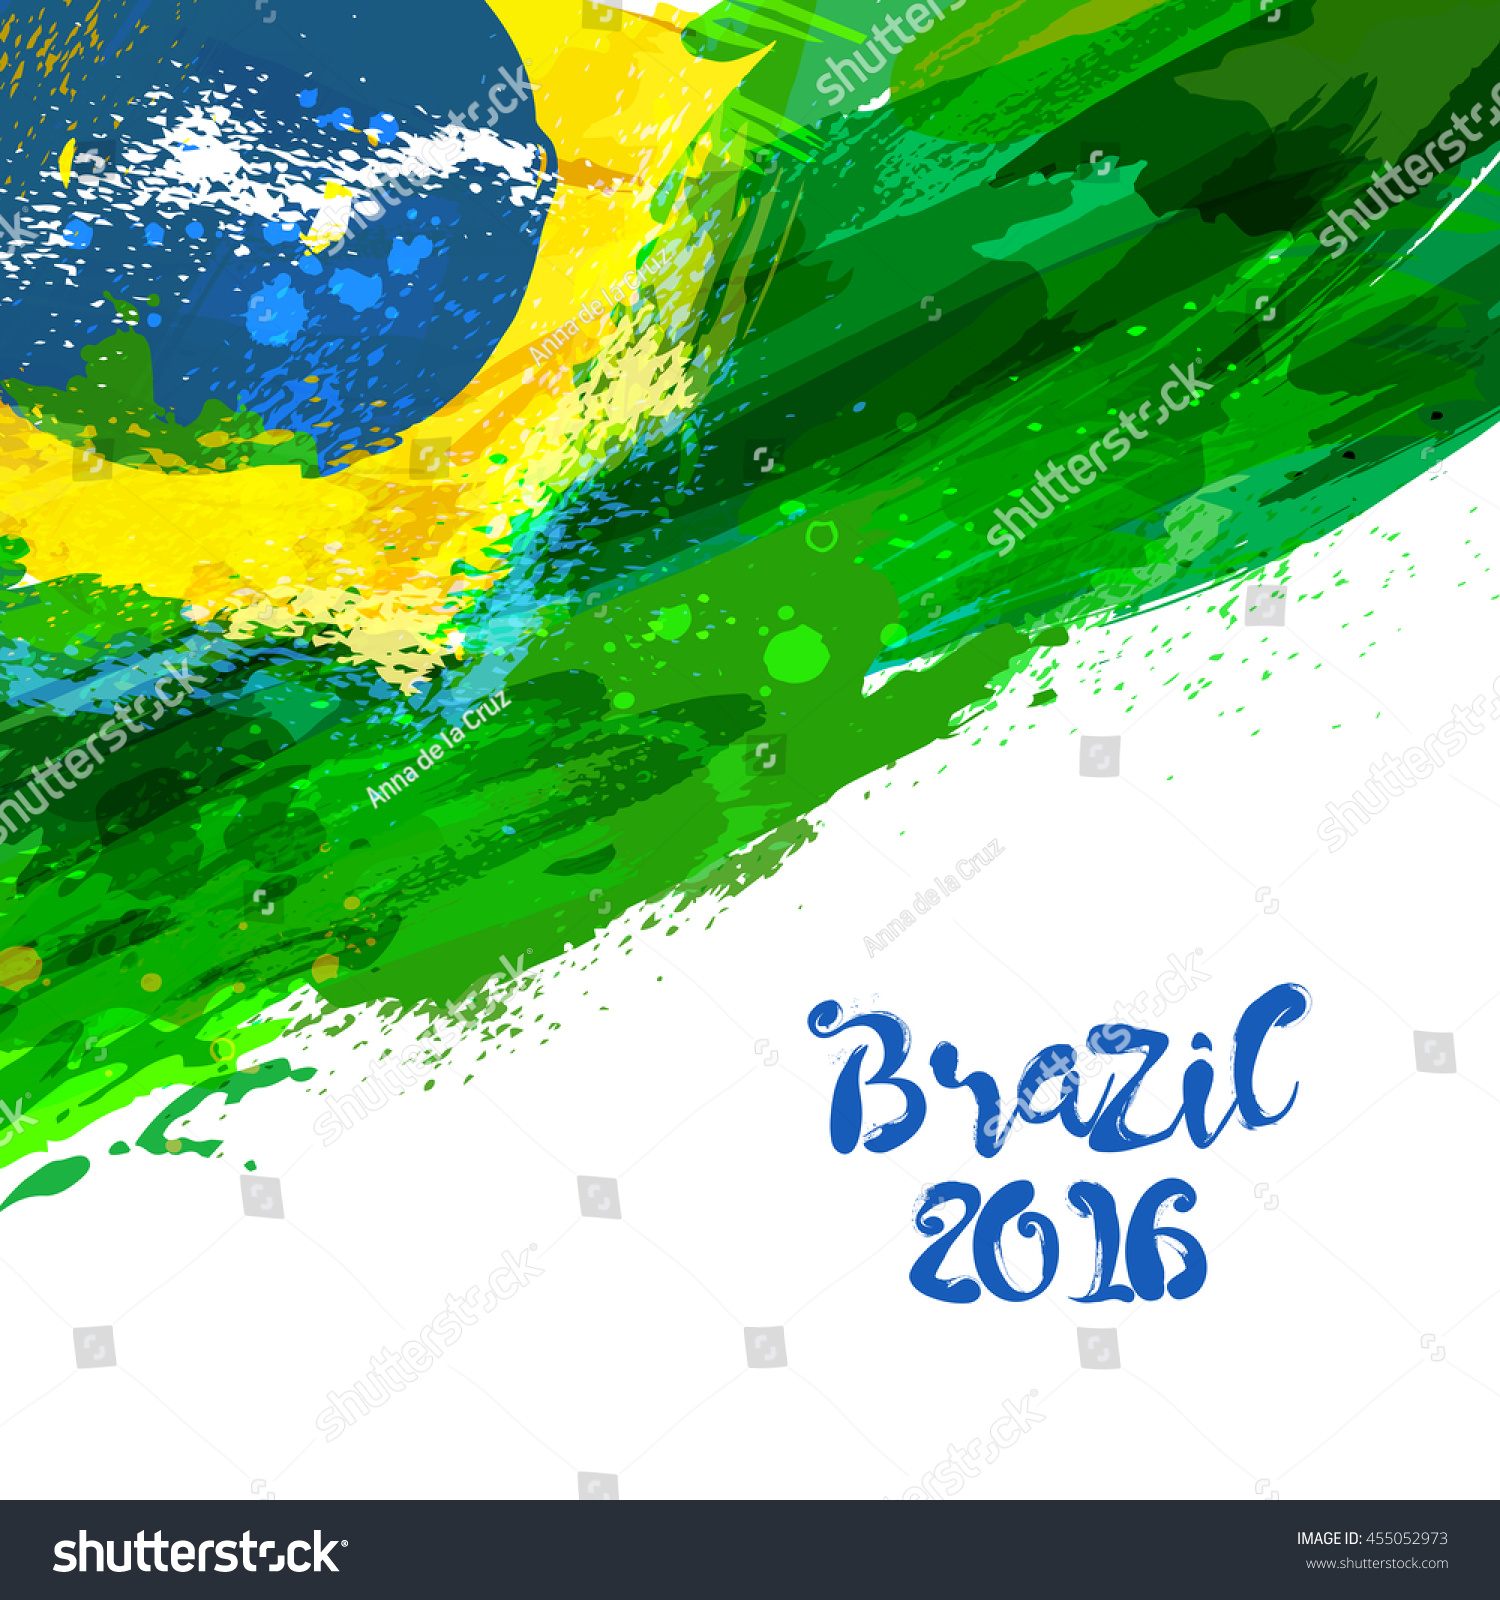 Handmade watercolor brazil flag brasil stock photos freeimages com - Brazilian Watercolor Flag Brasilia 2016 Watercolor Vector National Flag Watercolor Background In Brazilian